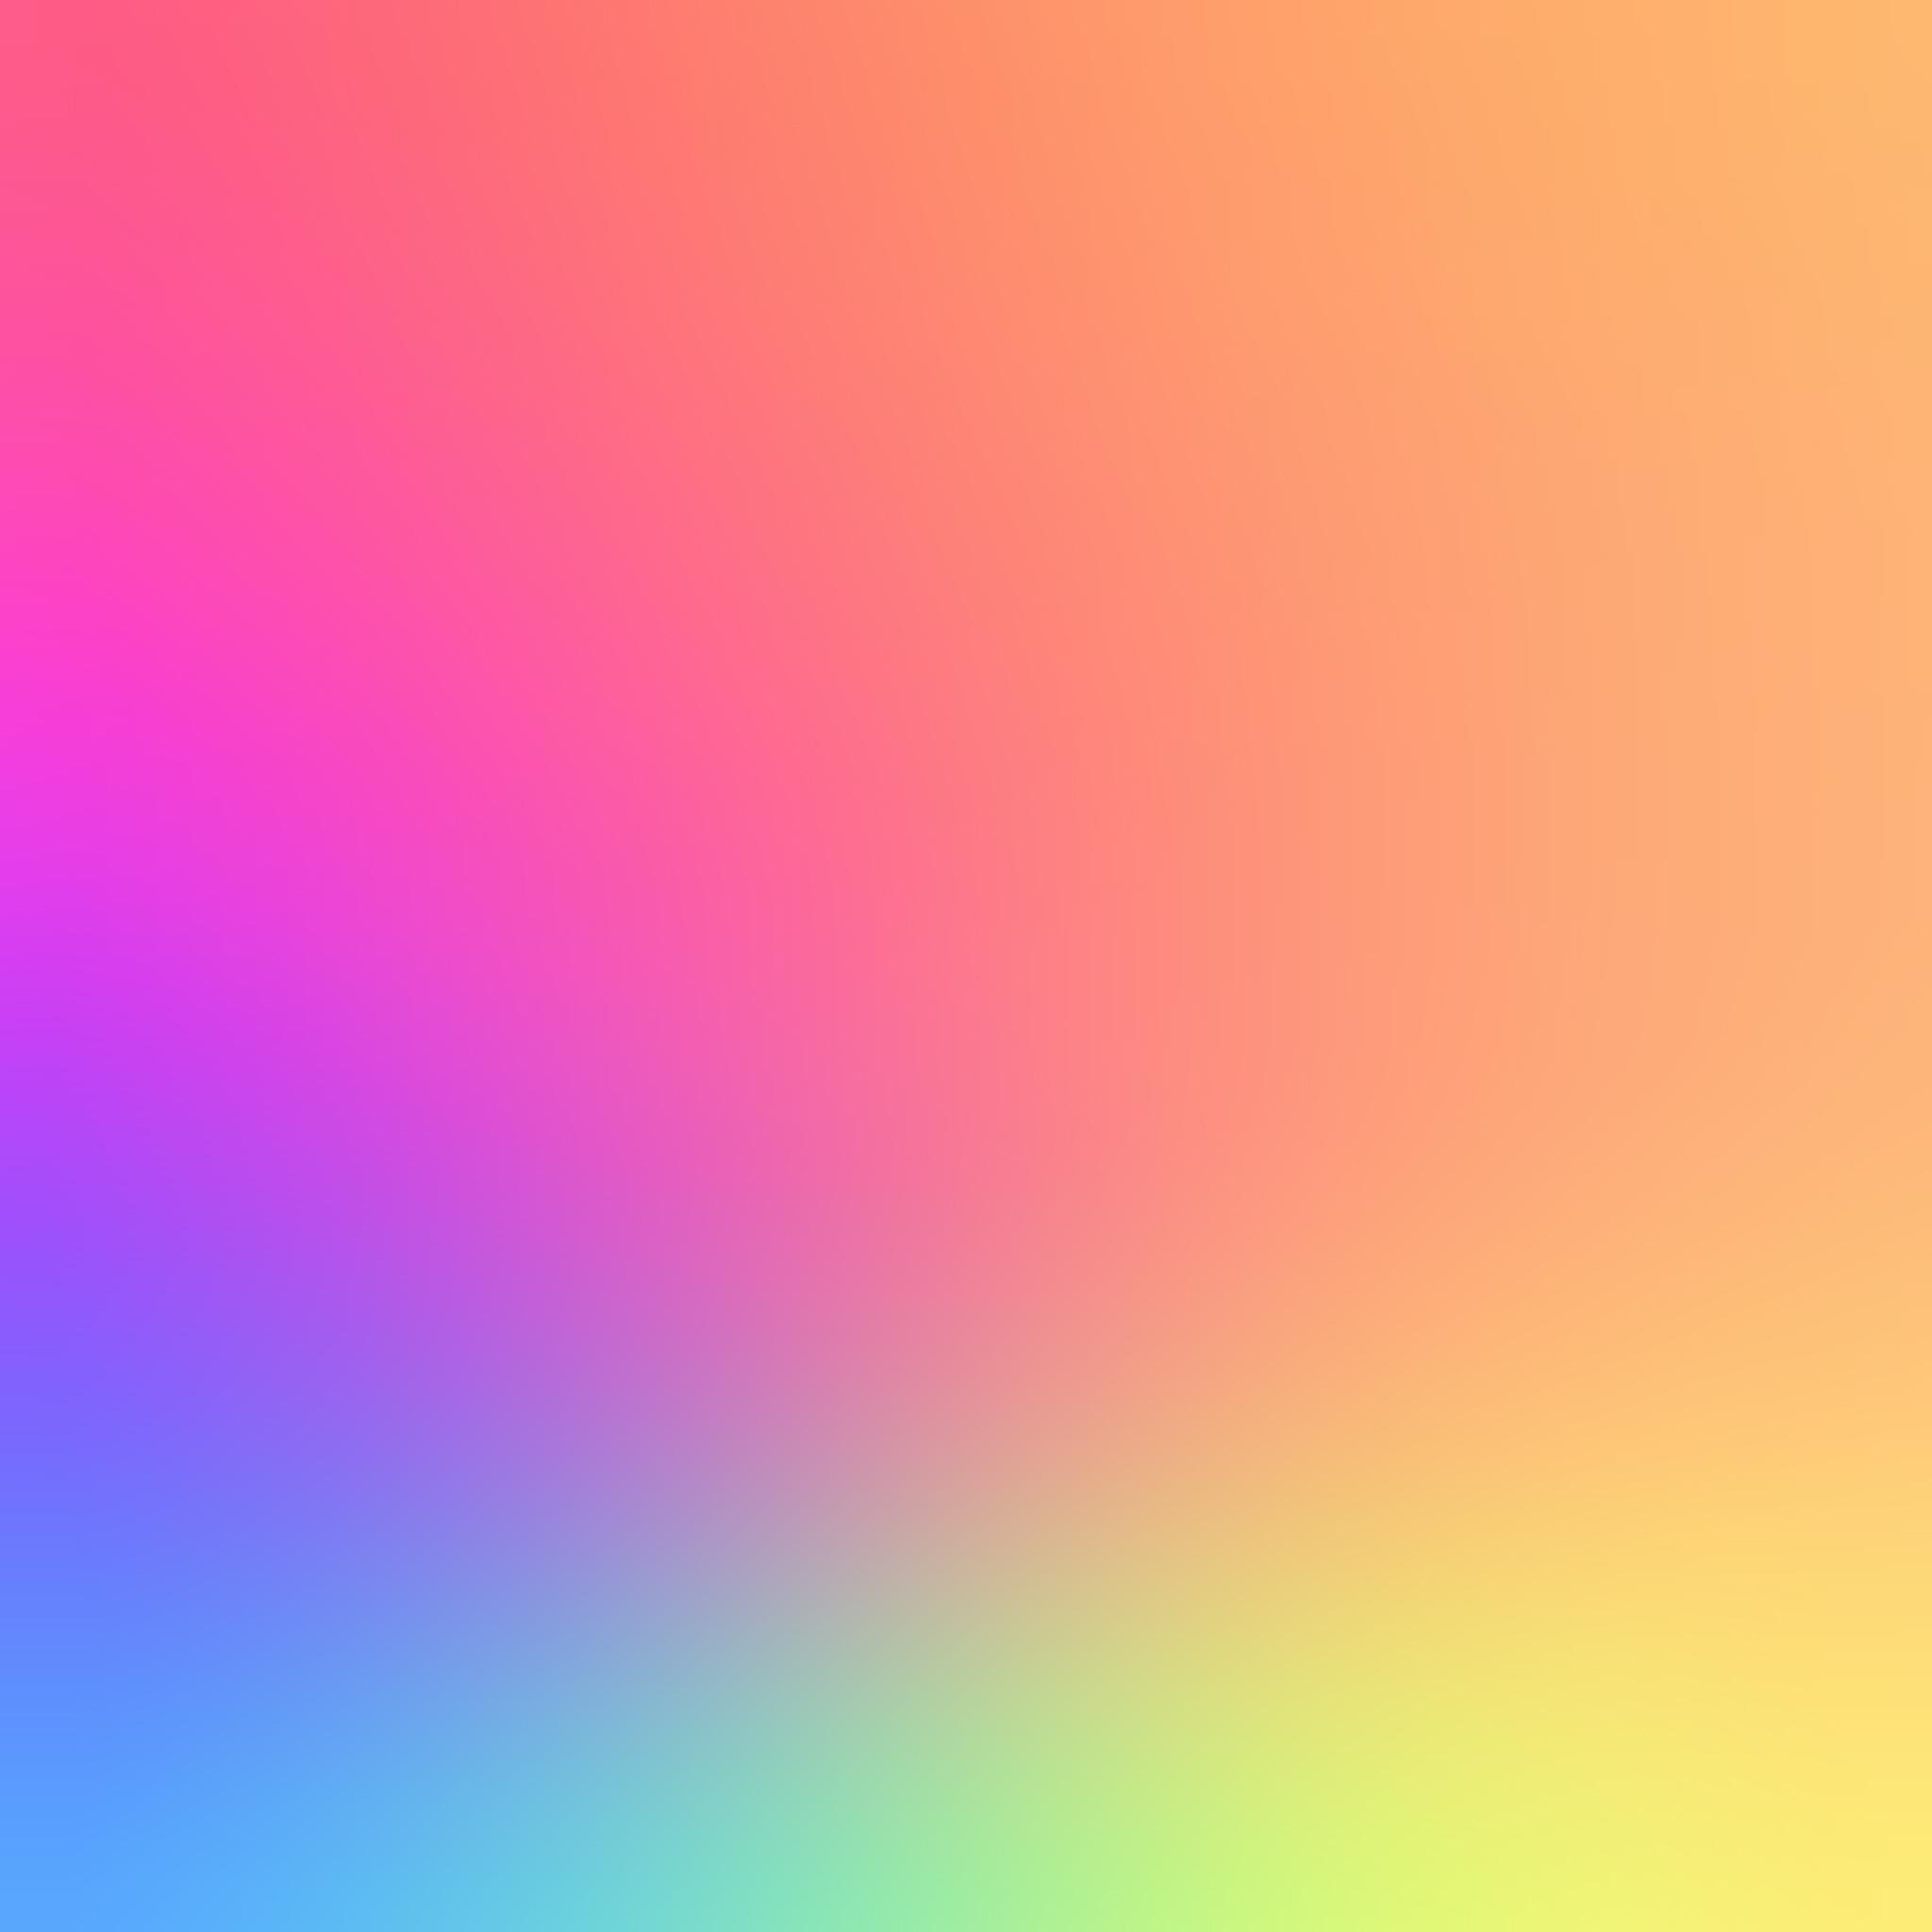 49 Fondos De Pantalla Para IPad Con IOS 7 [Wallpapers IPad